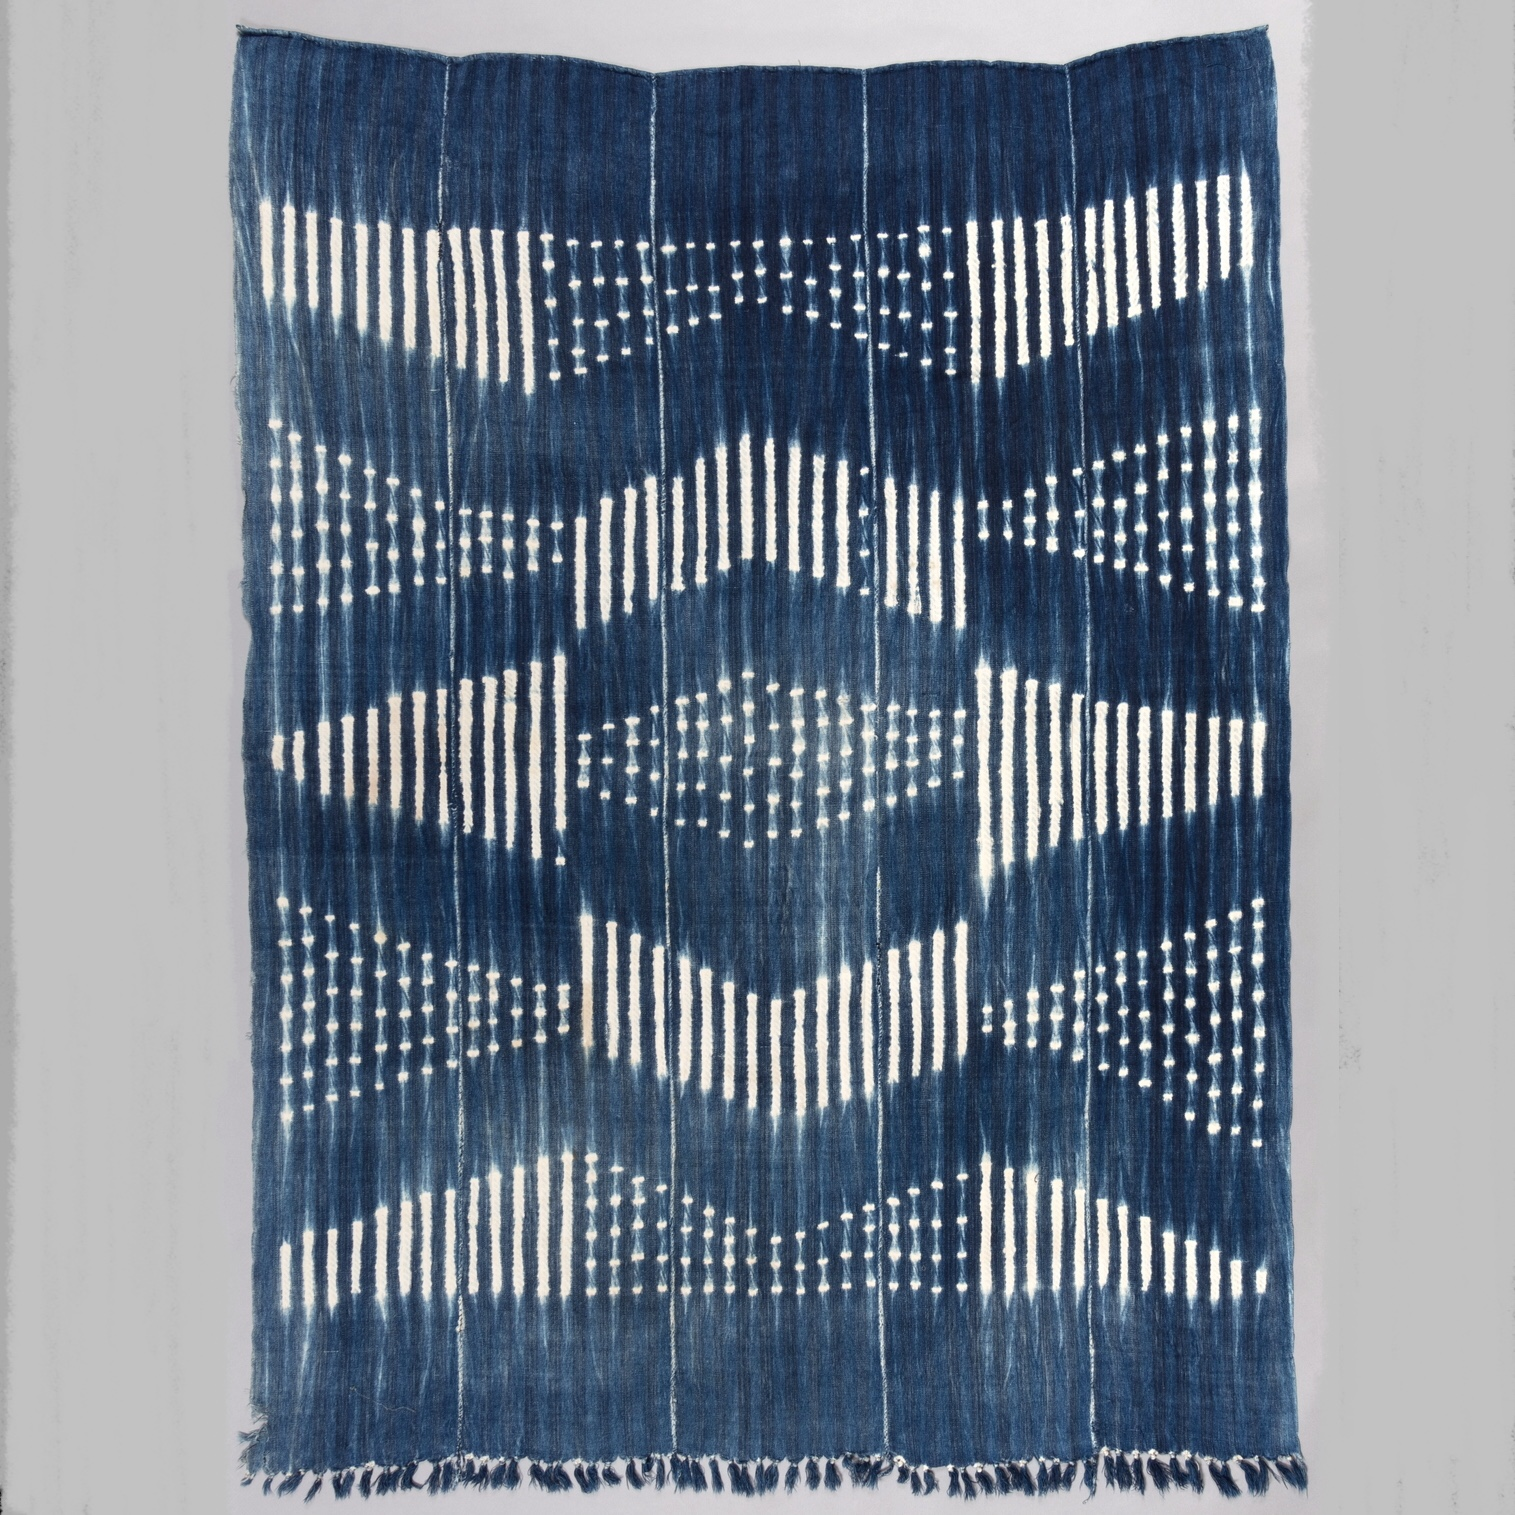 AN INCREDIBLE INDIGO CLOTH. MOSSI TRIBE BURKINA FASO ( No 3893 )